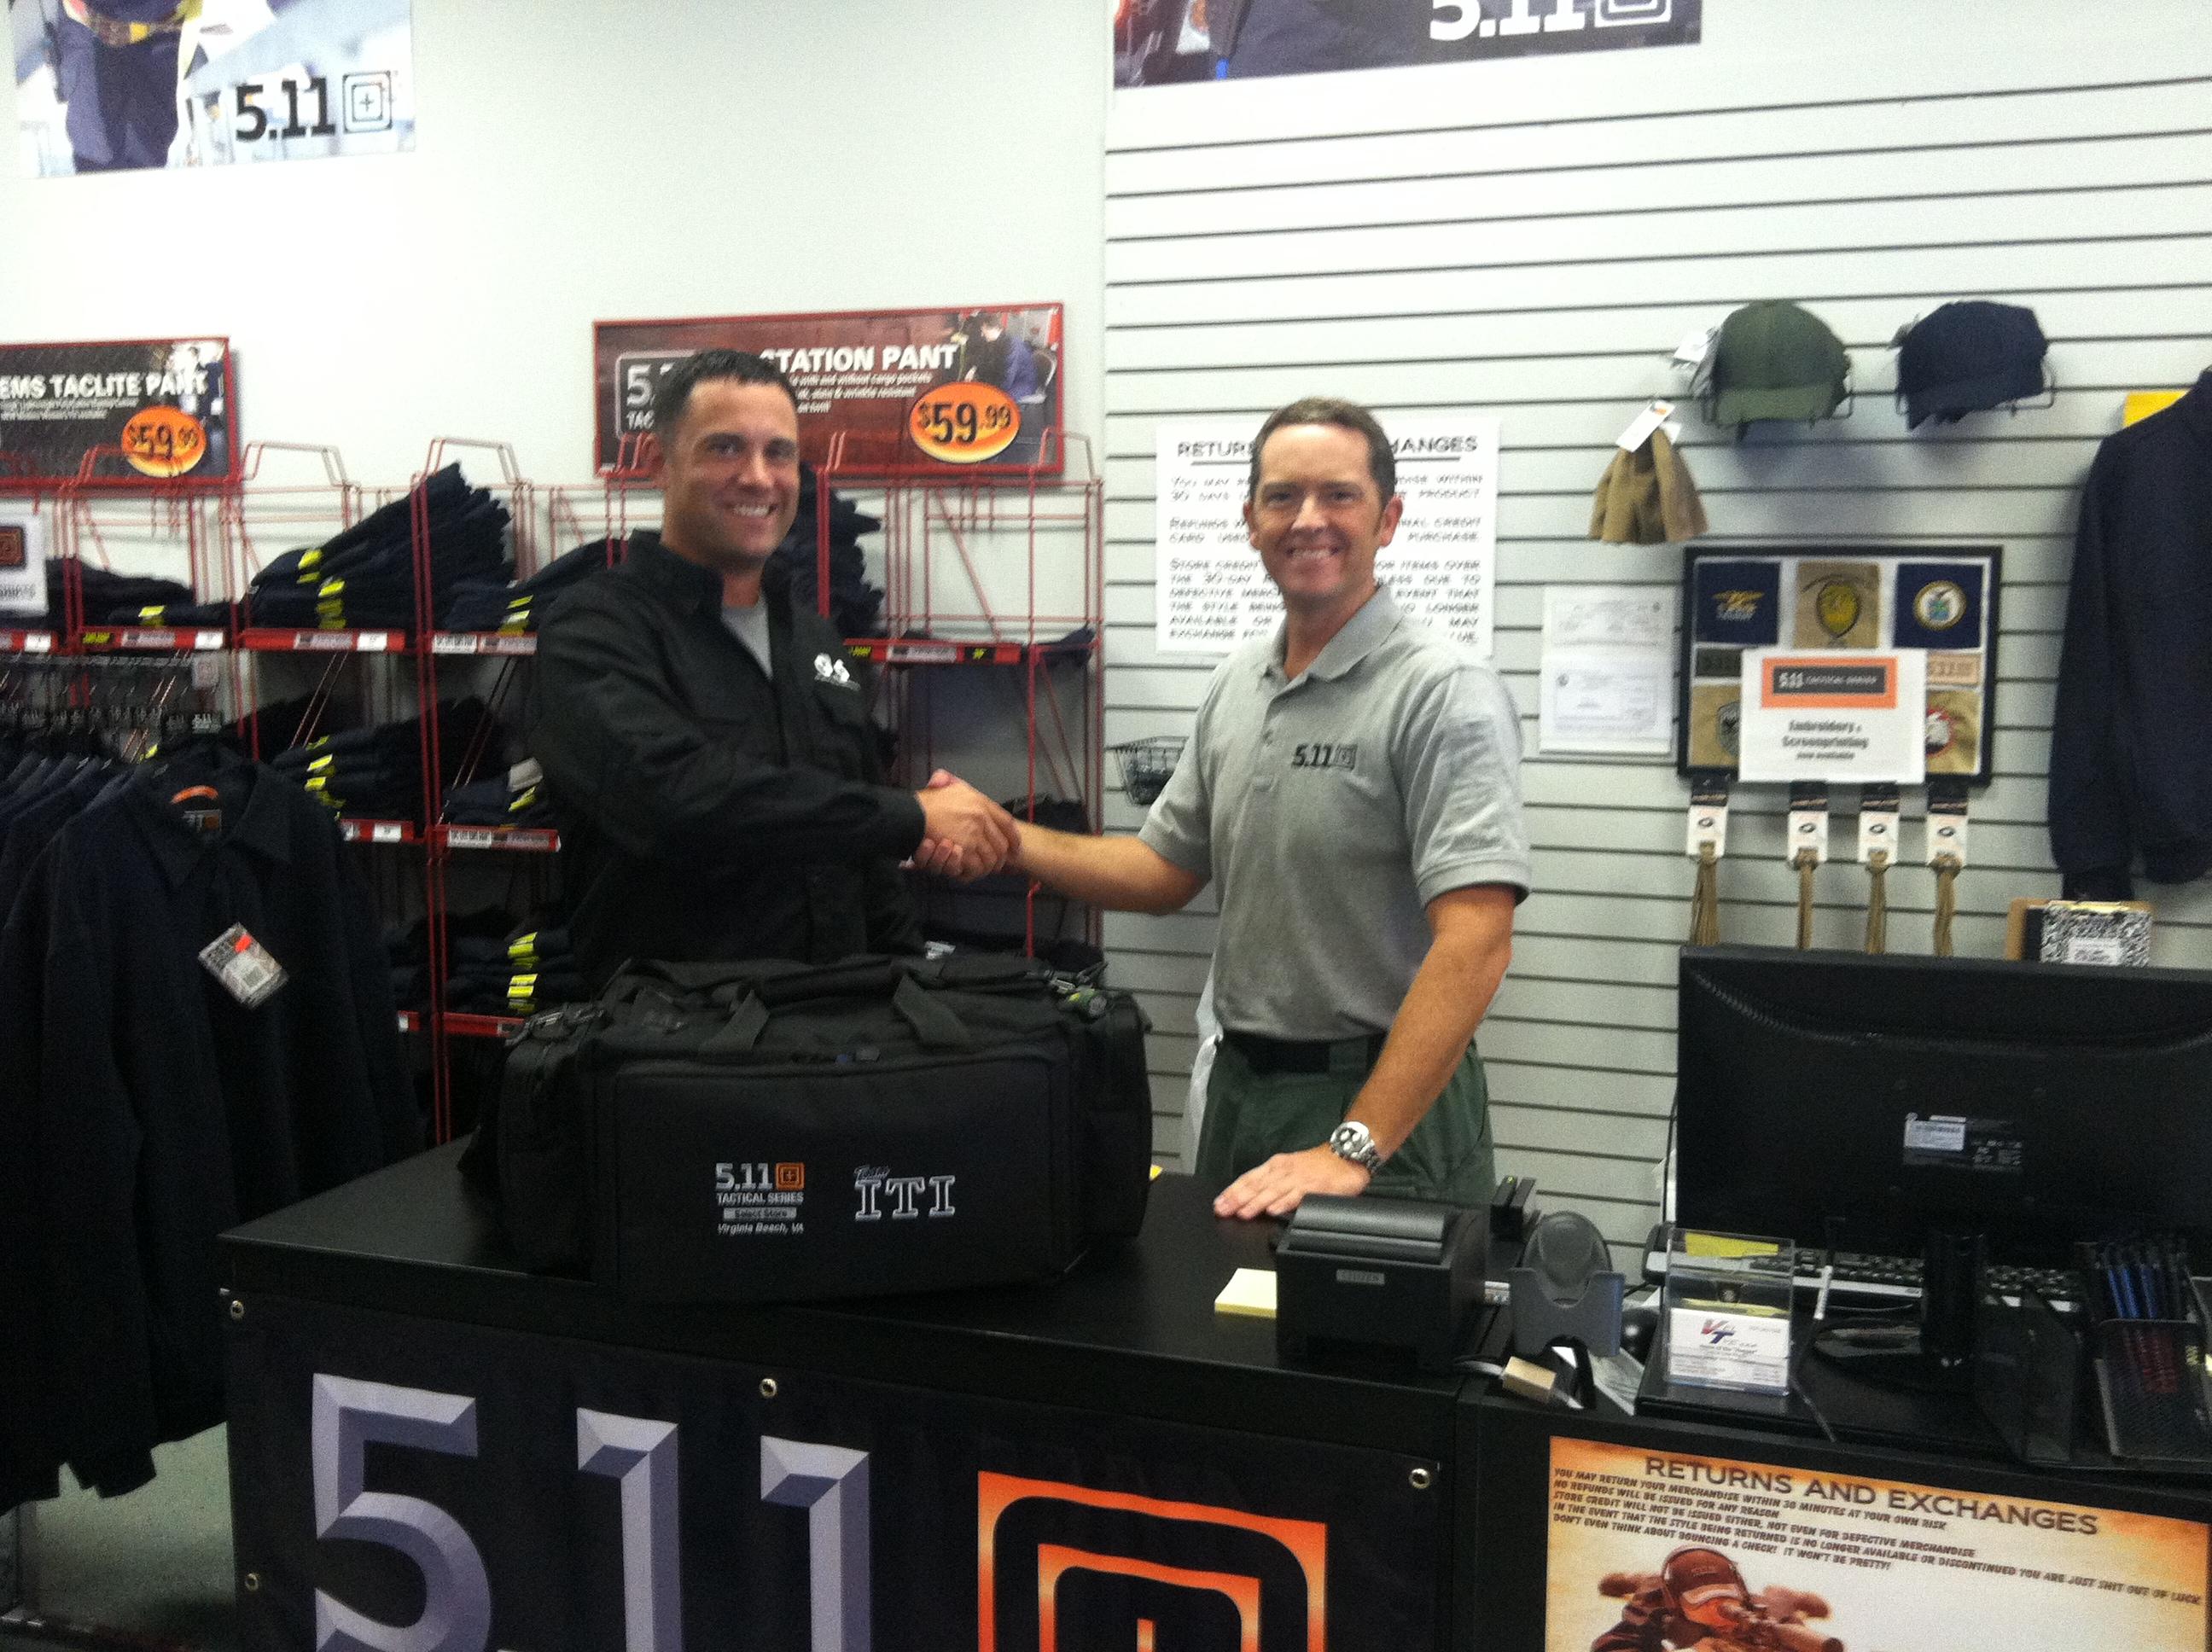 Brandon Wright L Team Iti Captain And Senior Firearms Instructor For Gs Iti